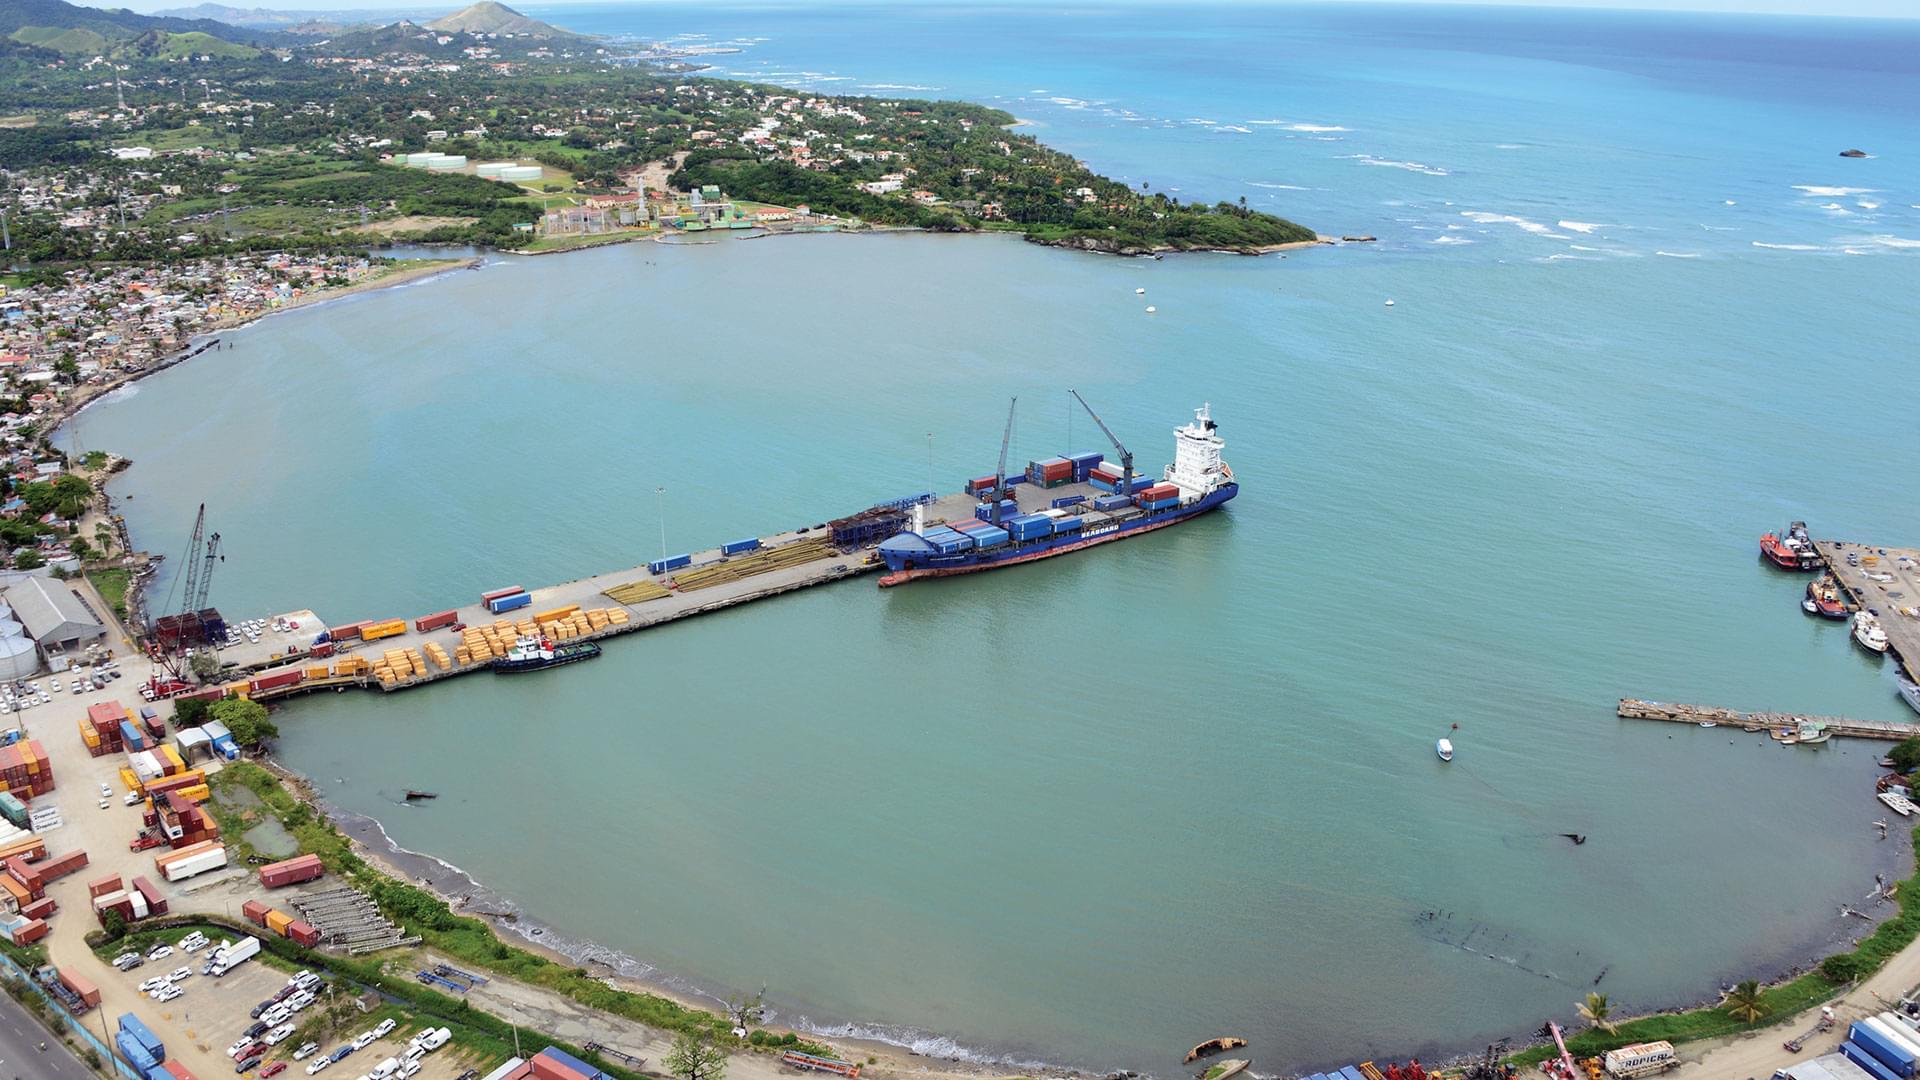 Puerto de Puerto Plata